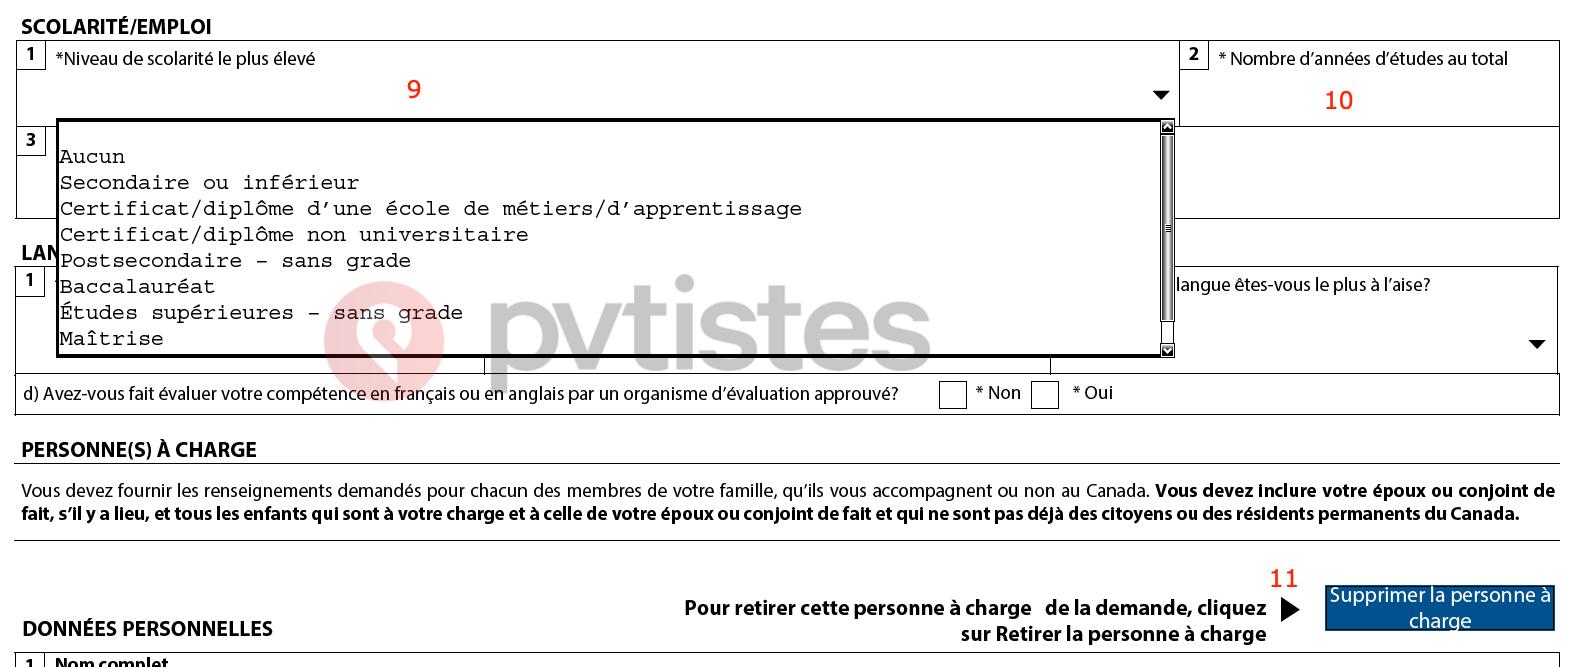 toriel Residence Permanente Canada - Federal 8